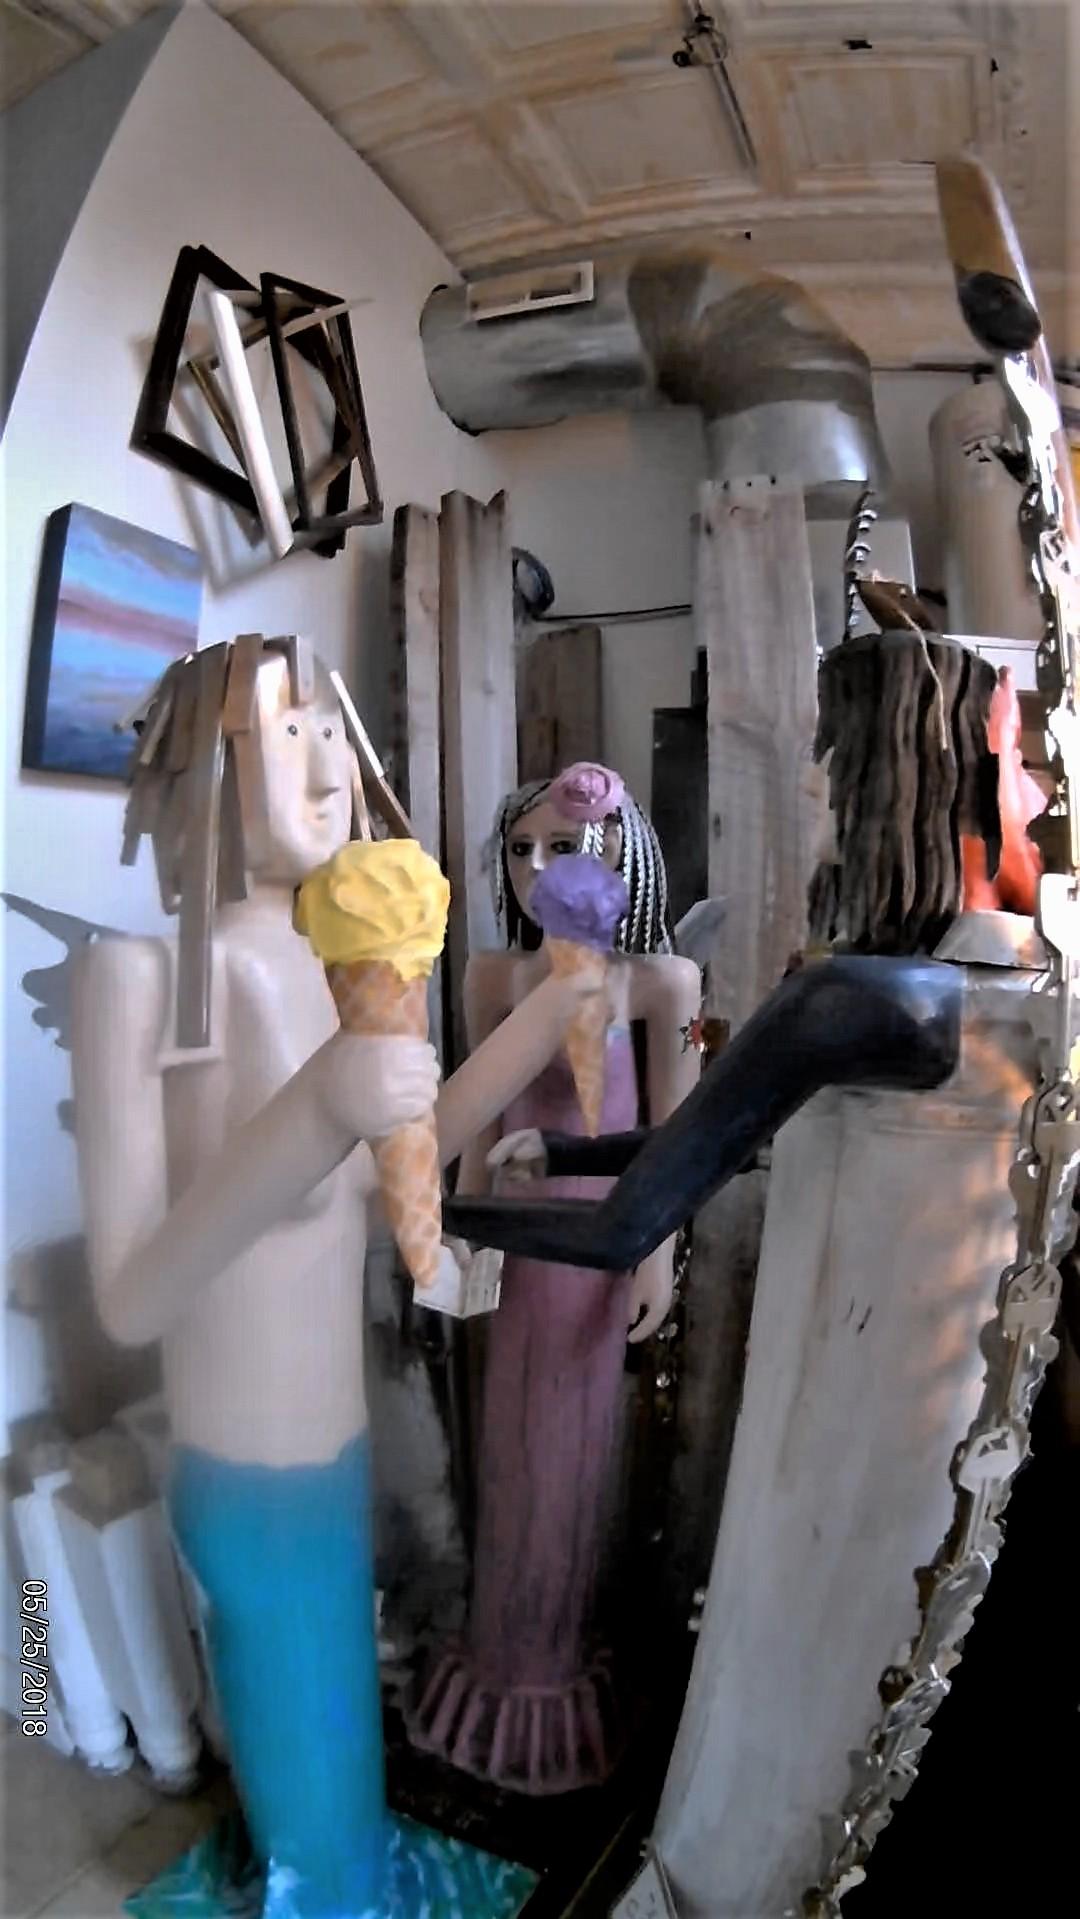 Angel Xls Doctor French Porn Tube fleetwoods circumnavigation - jack van ommens travels - part 3